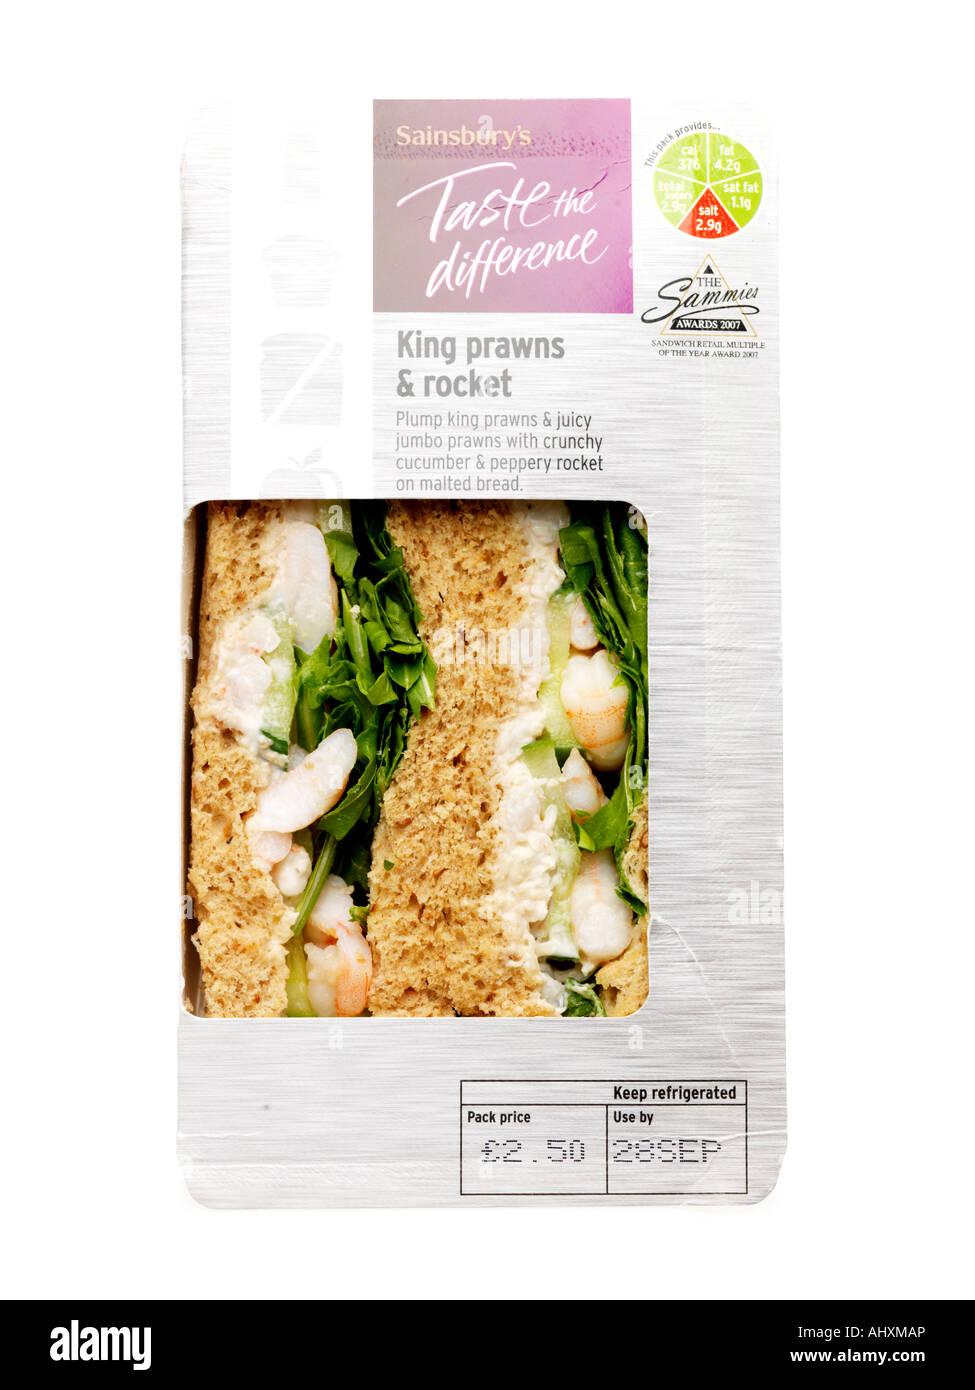 King Prawns and Rocket Sandwich - Stock Image